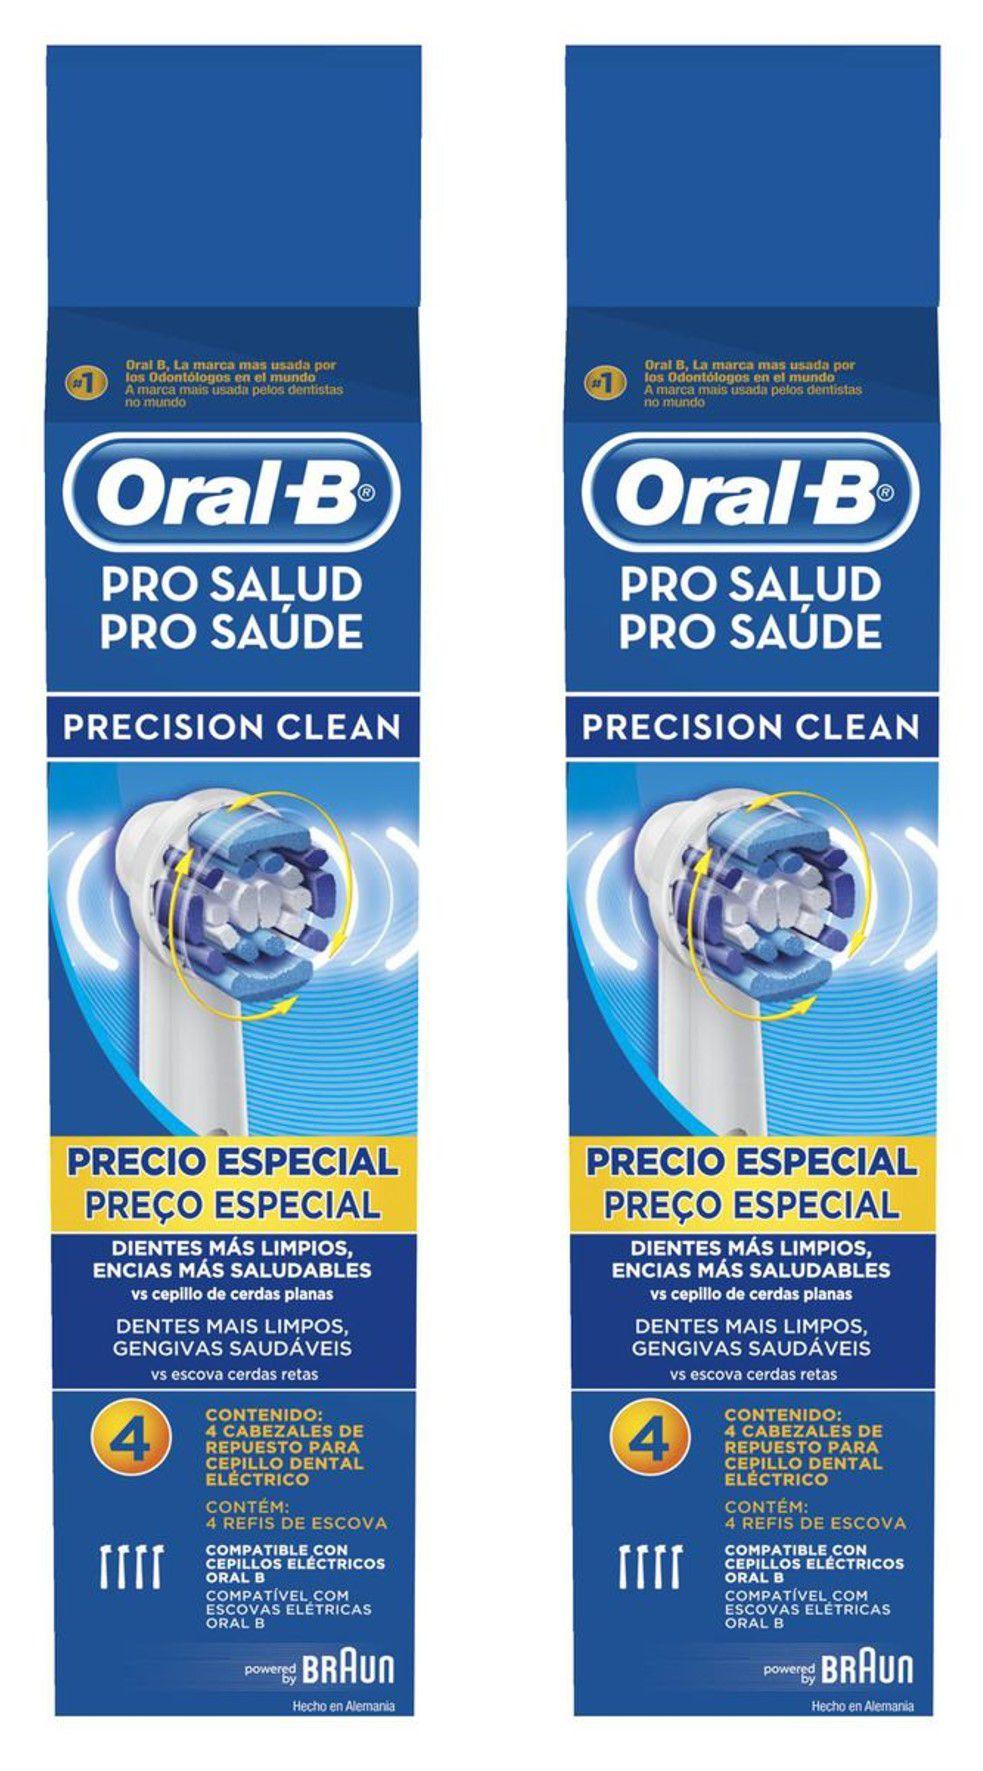 Kit Refil Escova Elétrica Oral-B Precision Clean com 8 unidades